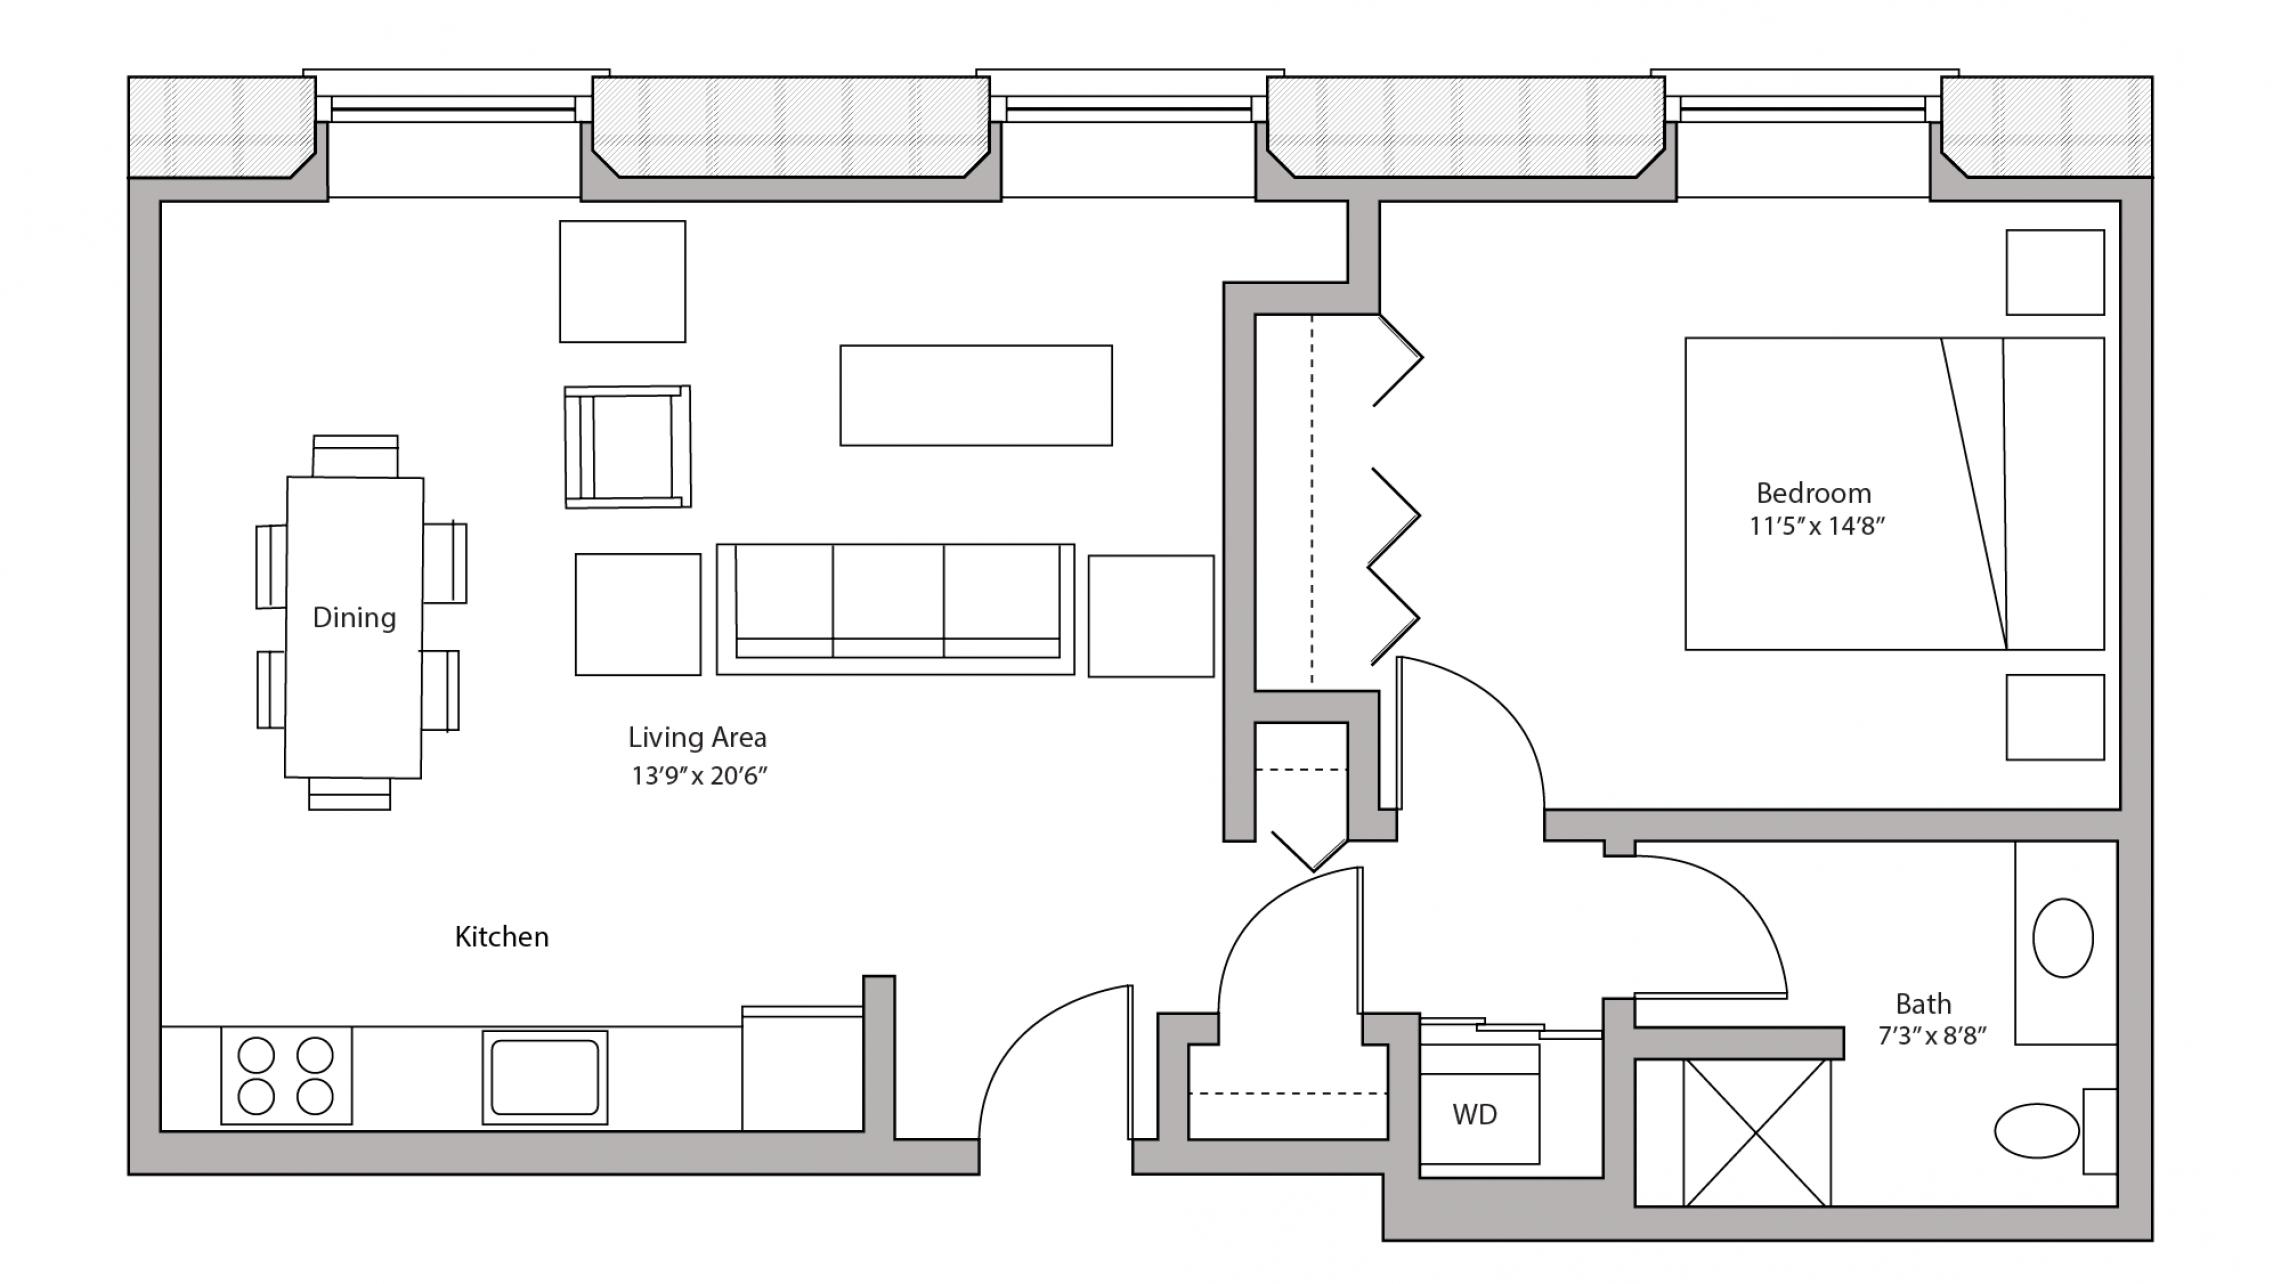 ULI Tobacco Lofts E103 - One Bedroom, One Bathroom